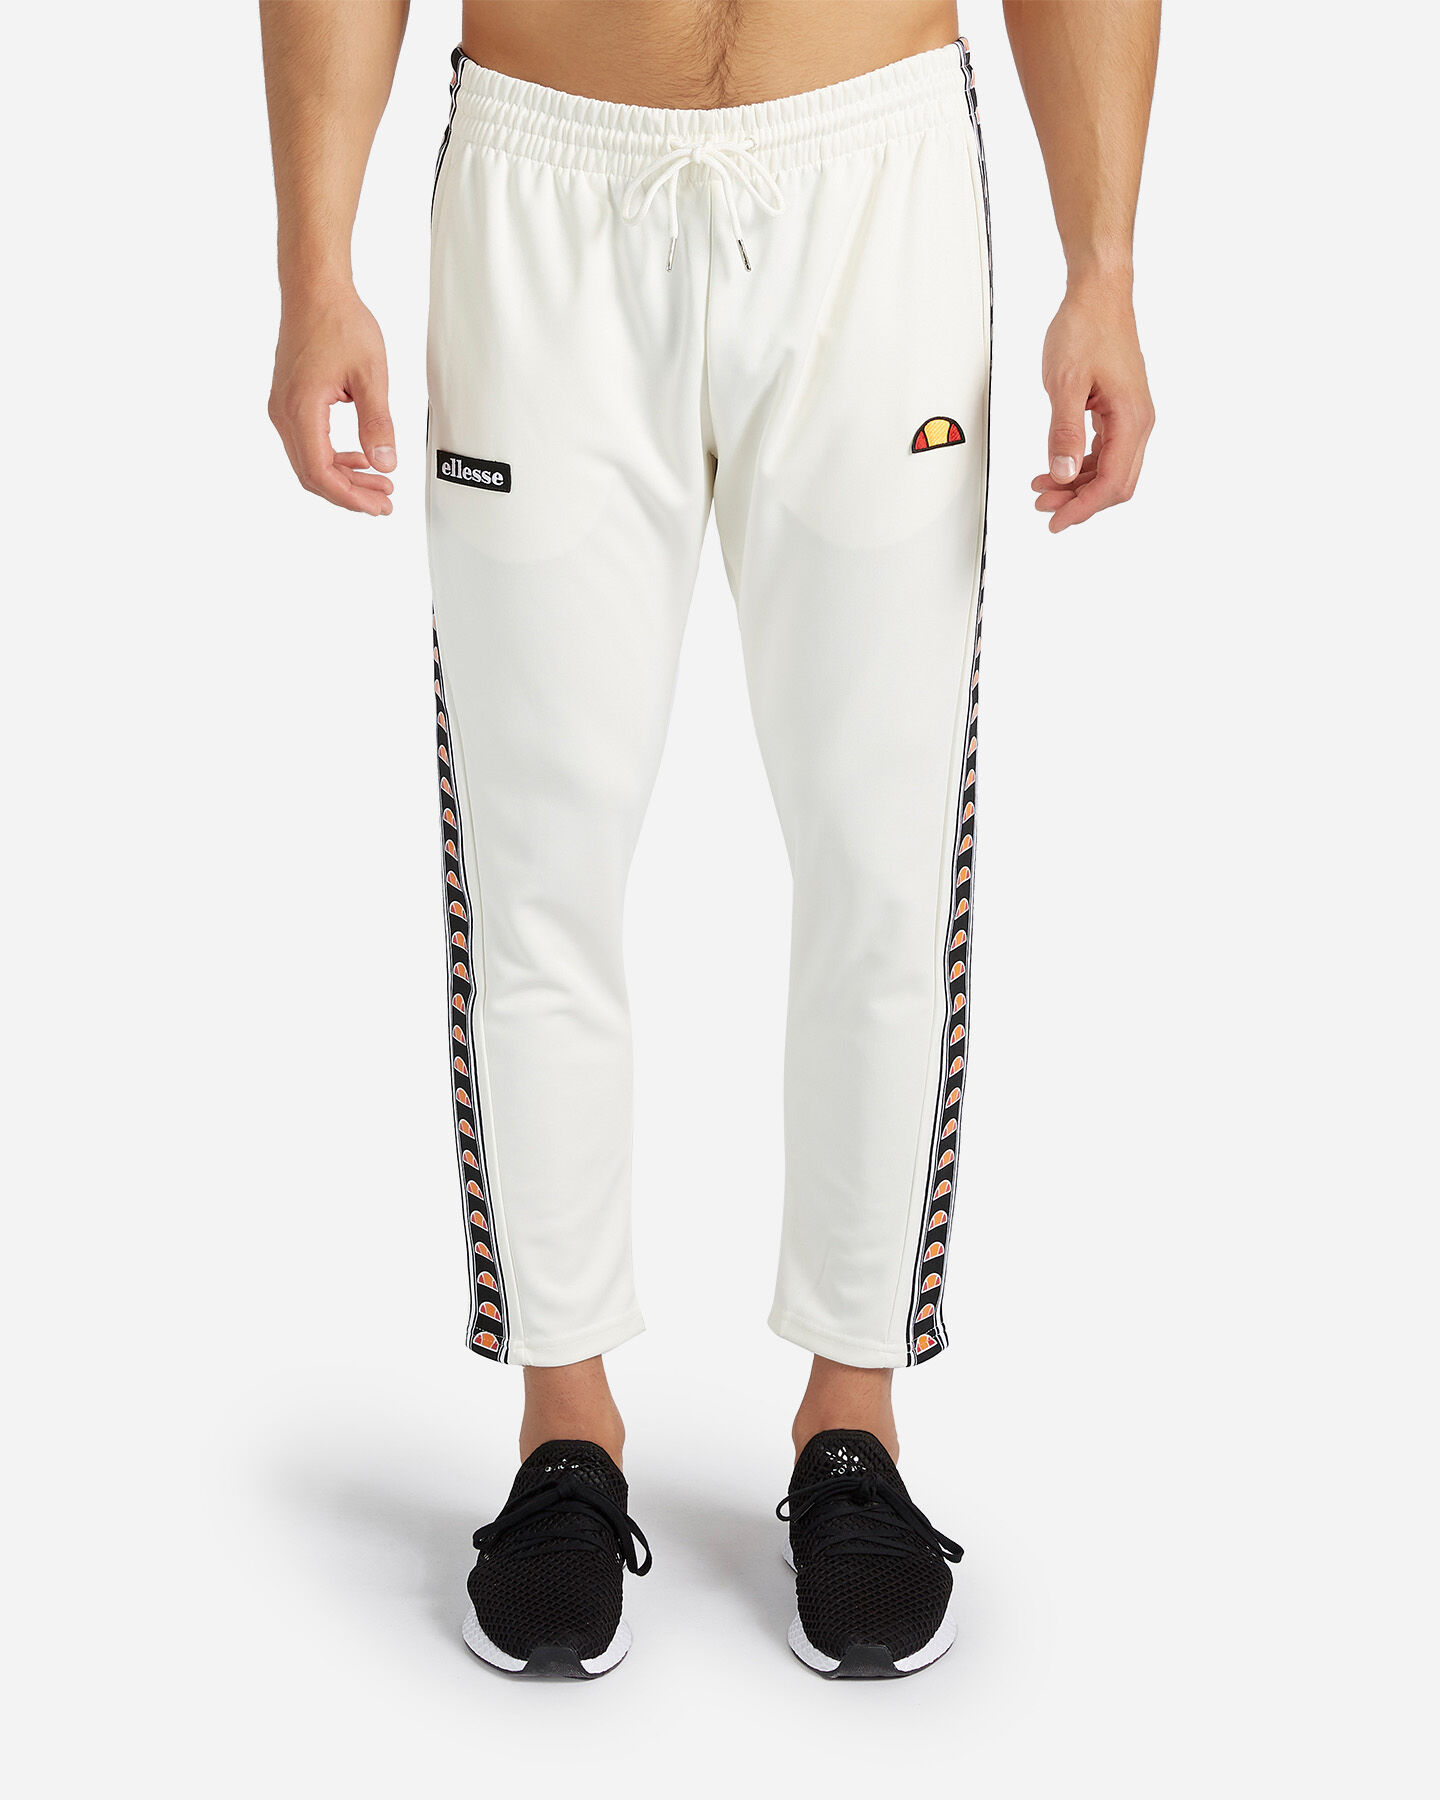 T shirt, felpe, pantaloni e intimo sportivo da uomo